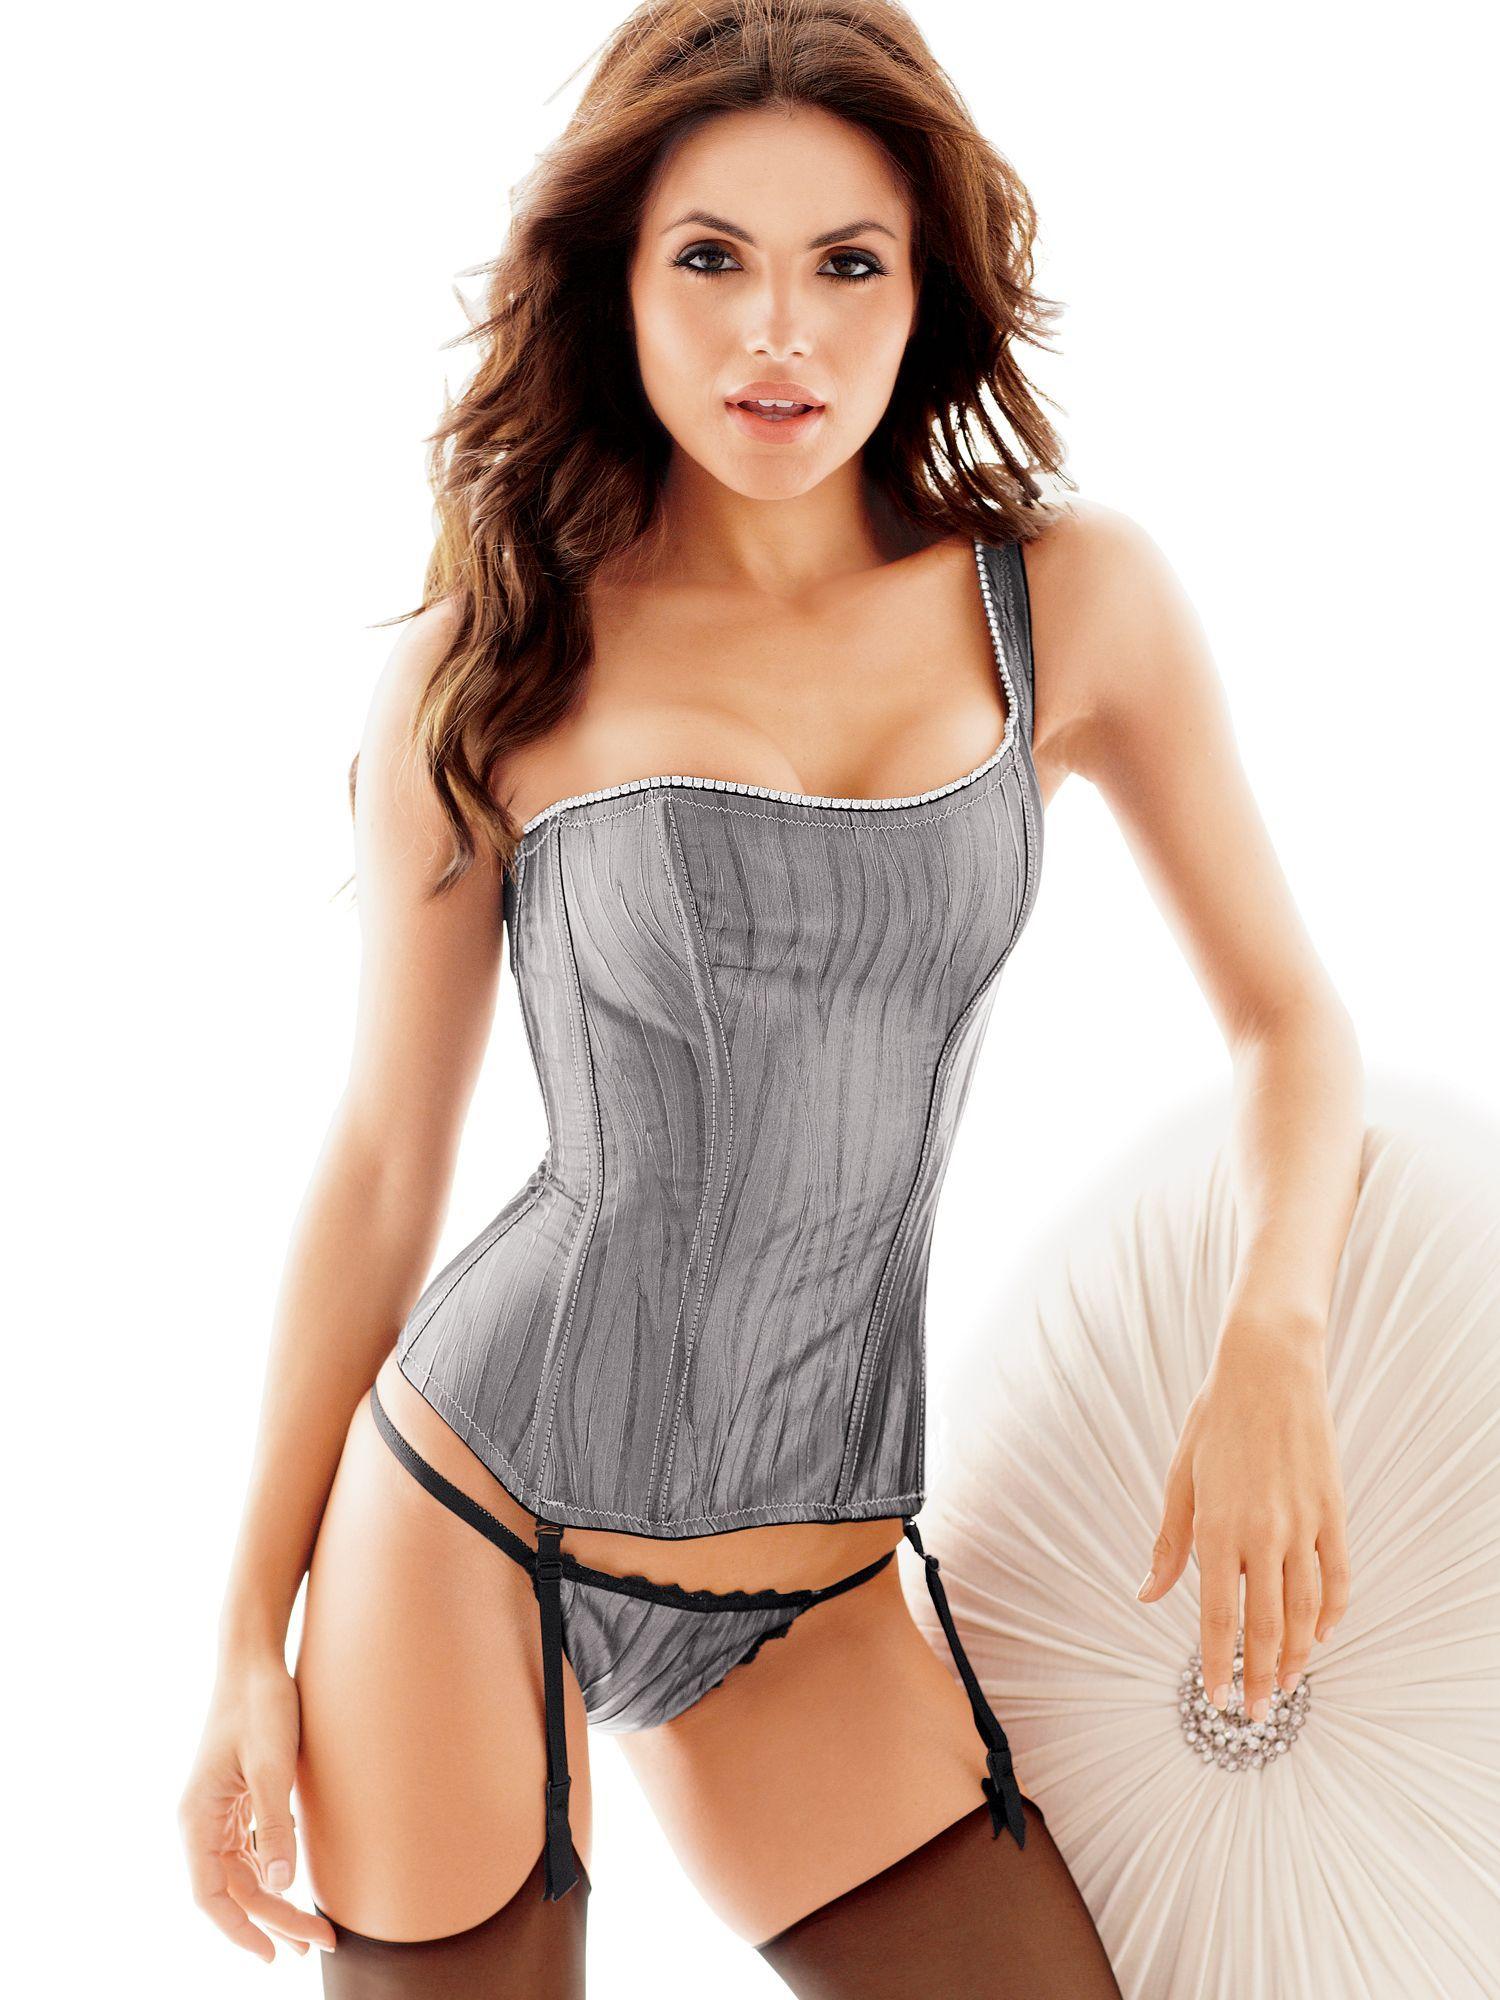 find fredericks of hollywood lingerie web site